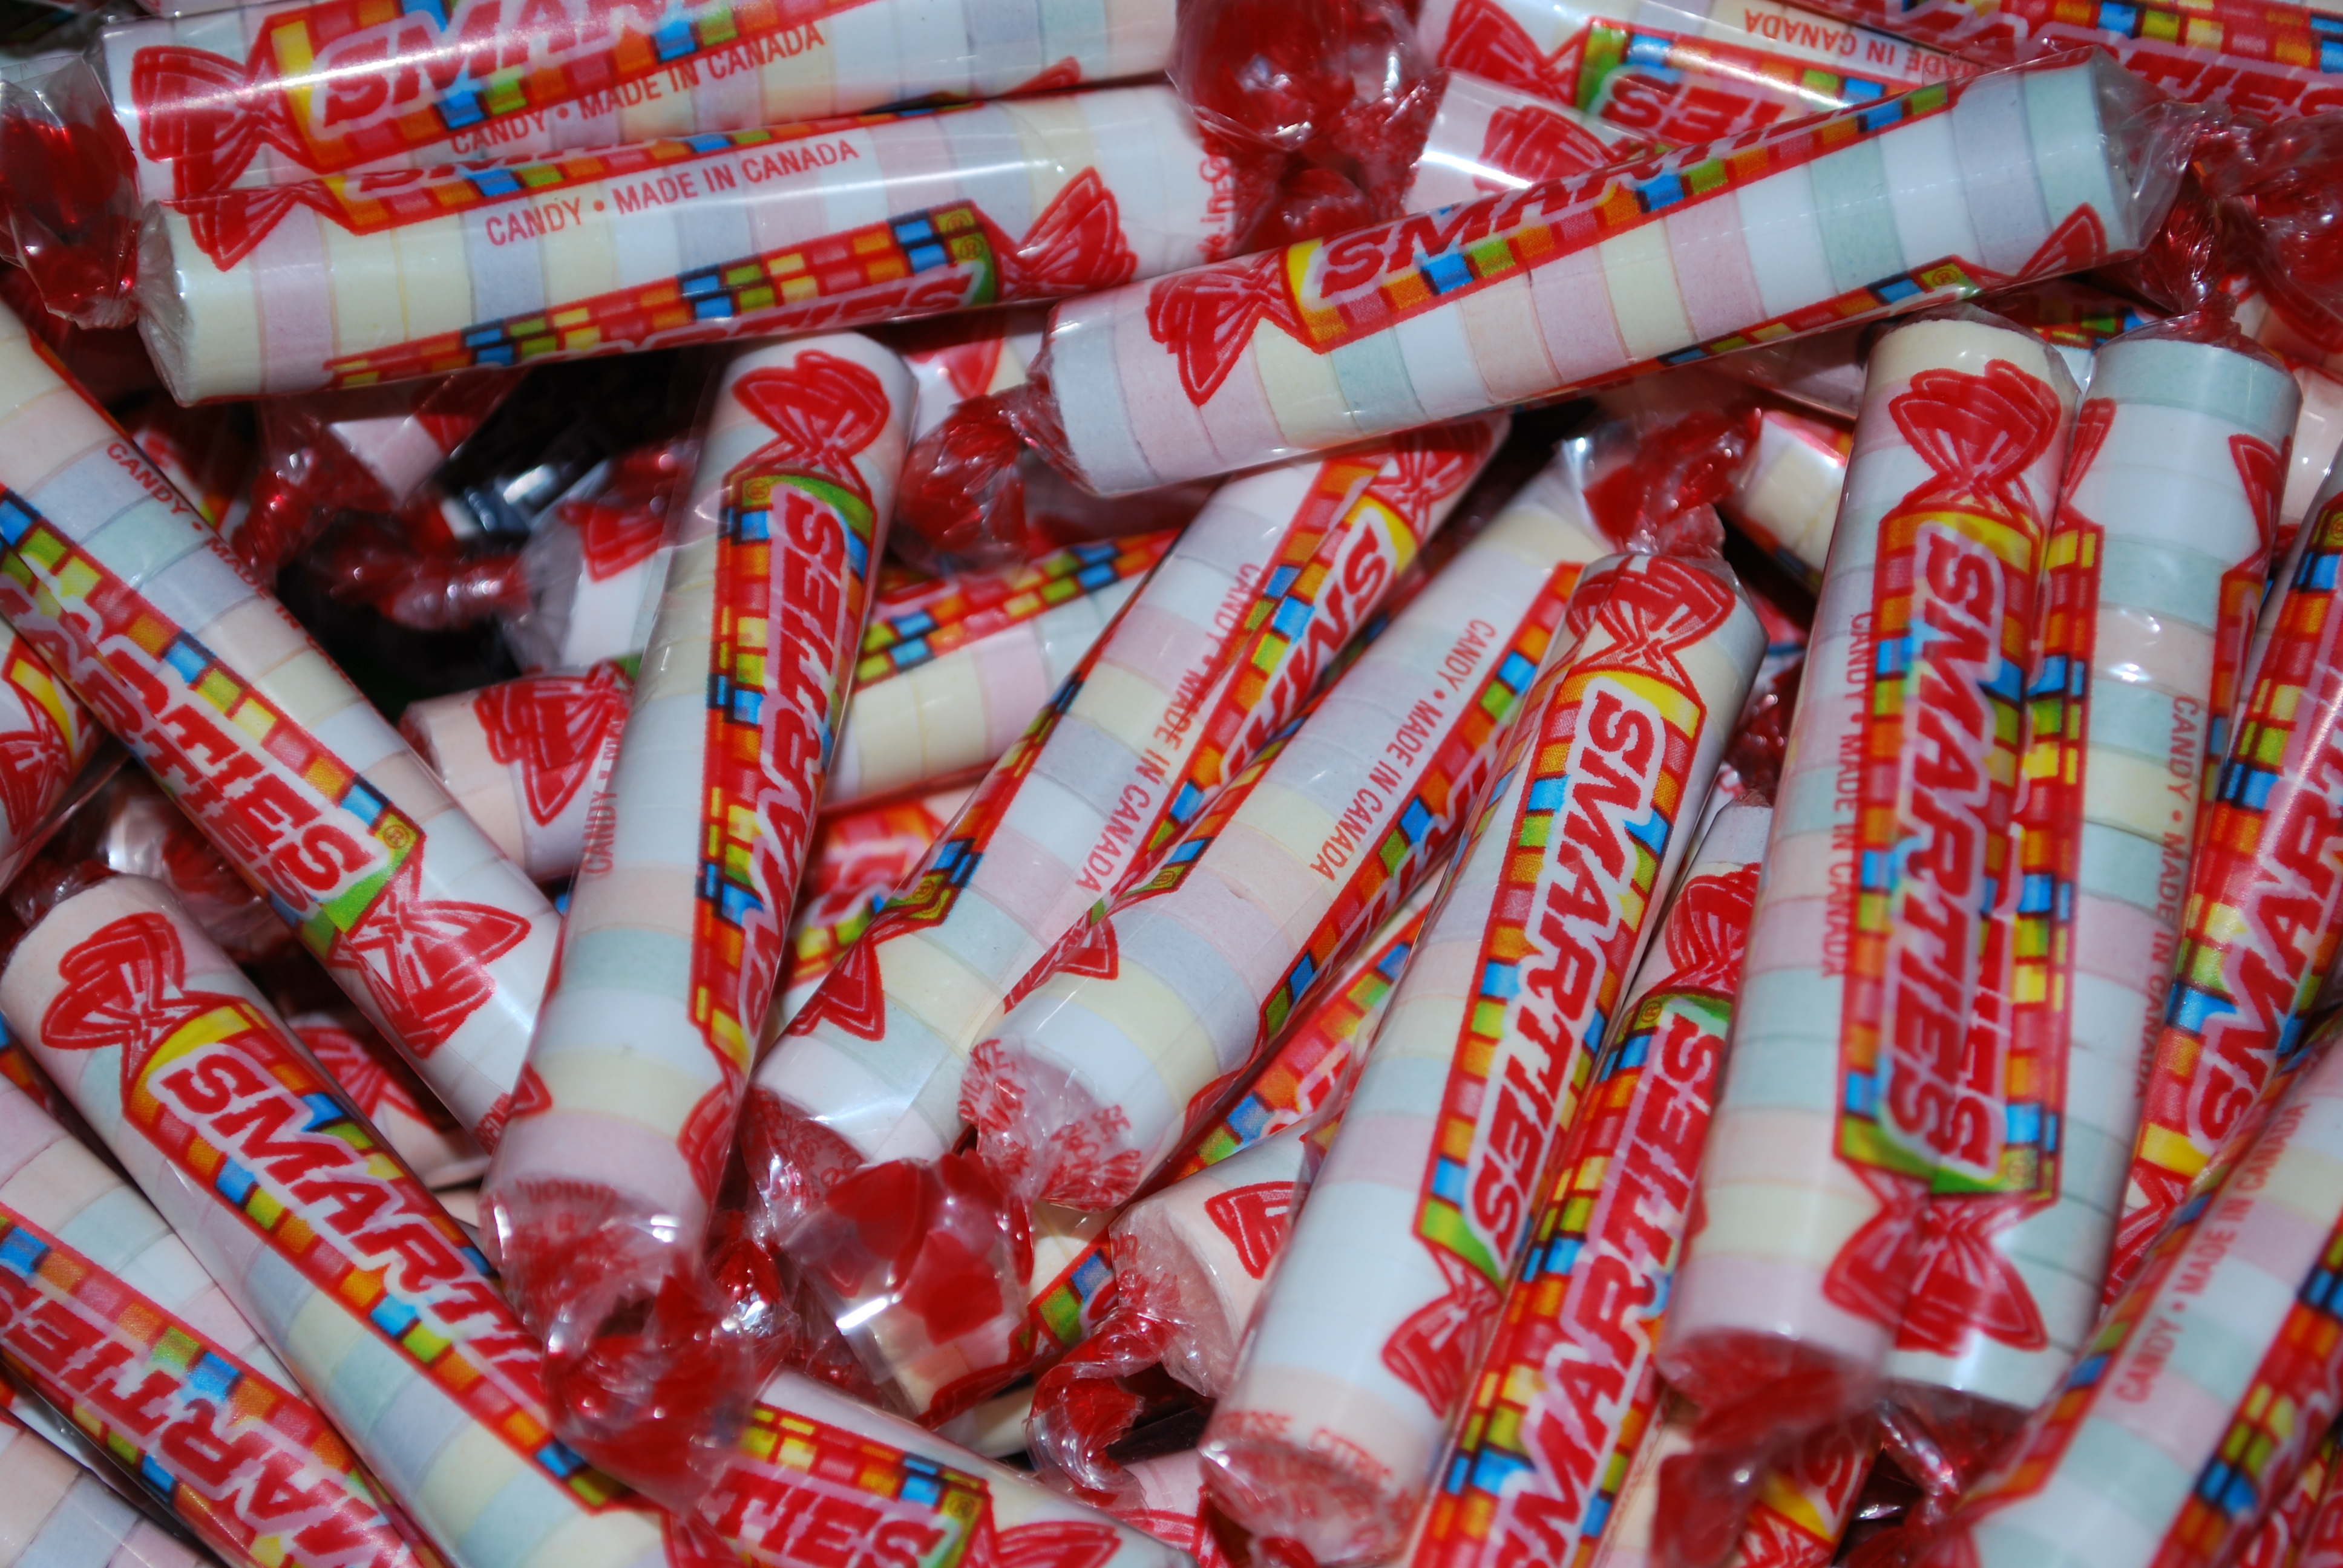 File:Bowl of smarties.jpg Smarties Candy